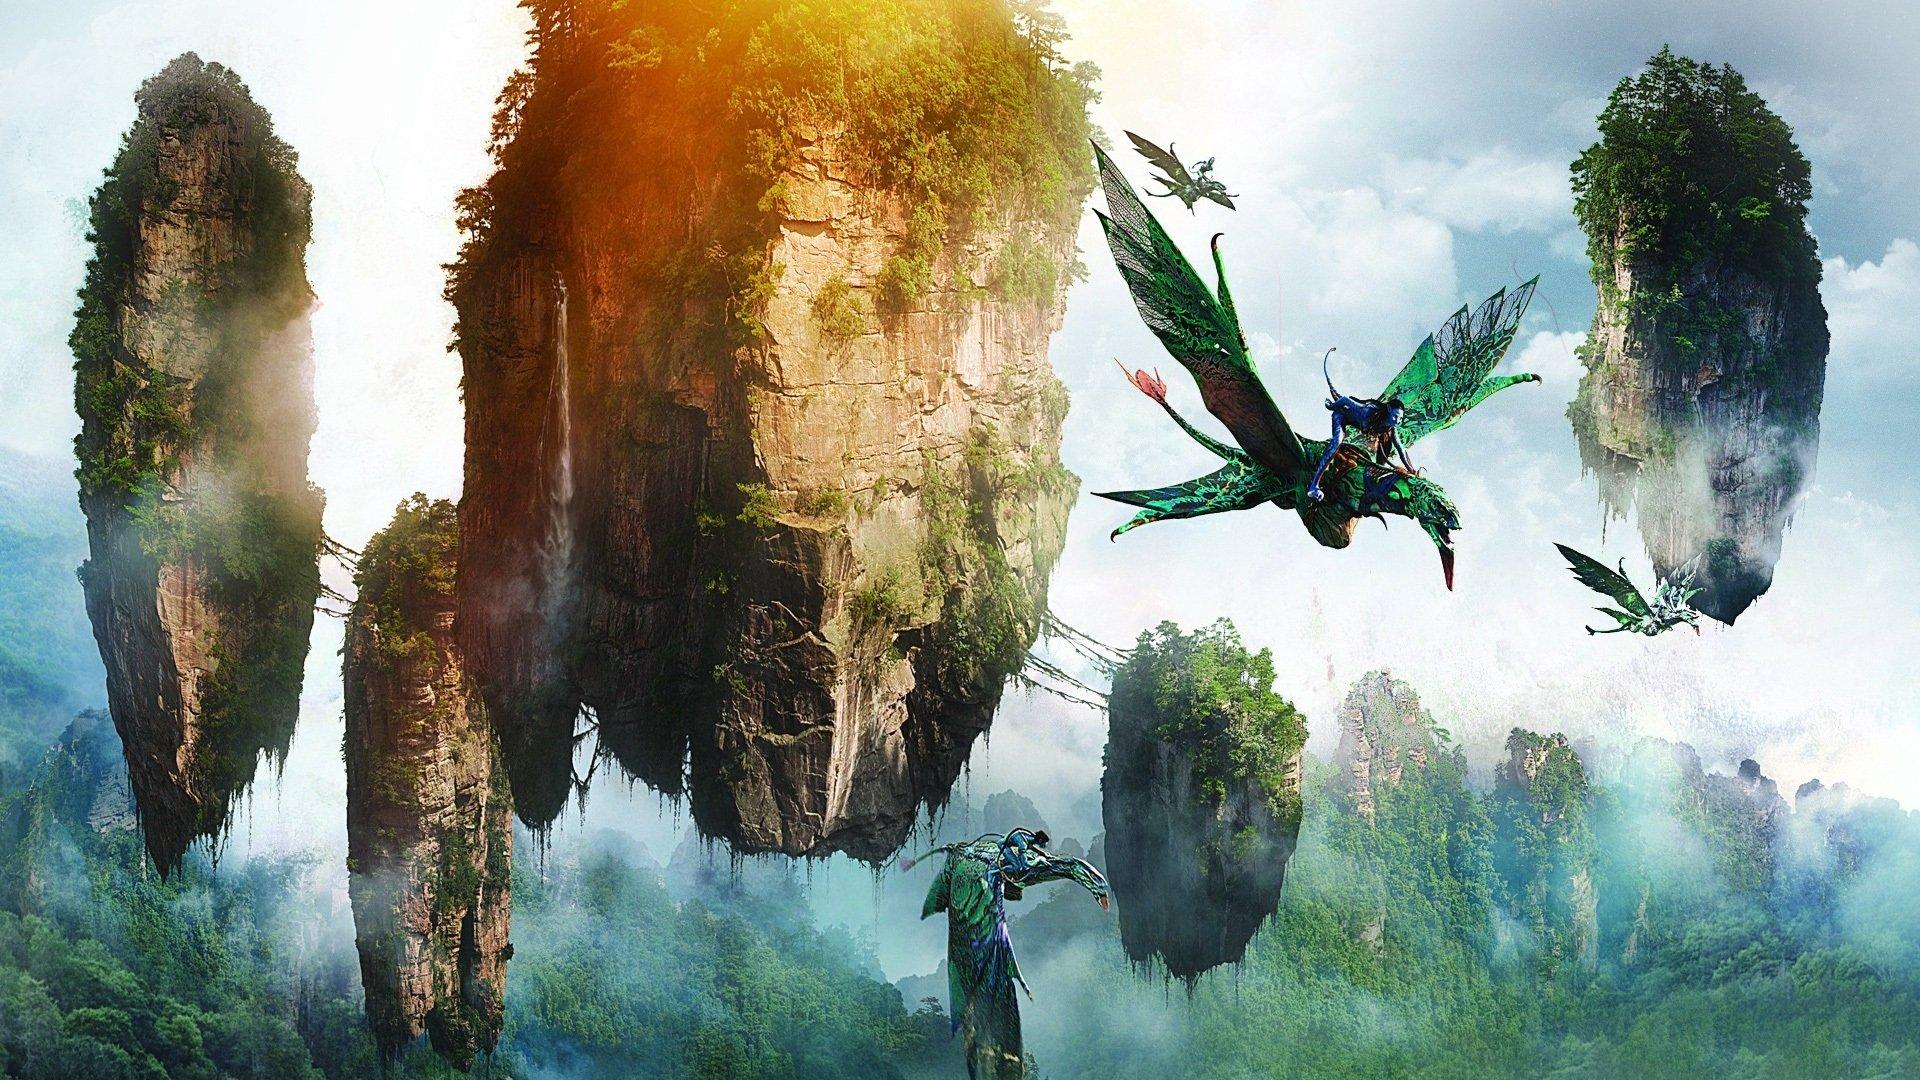 Avatar Fond d'écran HD | Arrière-Plan | 1920x1080 | ID:674362 - Wallpaper Abyss